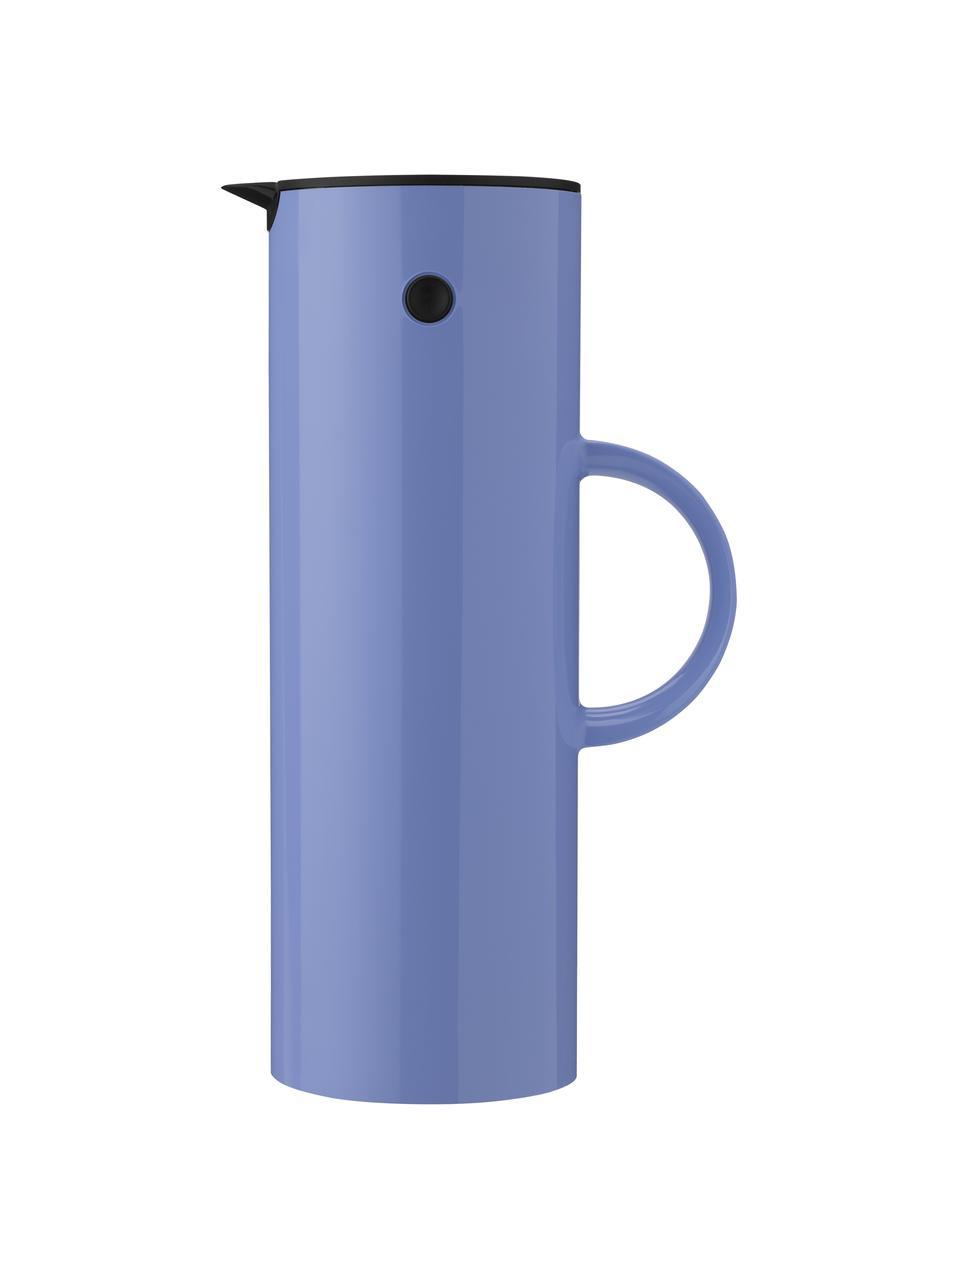 Brocca isotermica blu lucido EM77, 1 L, Materiale sintetico ABS con inserto in vetro, Blu, Ø 11 x Alt. 30 cm